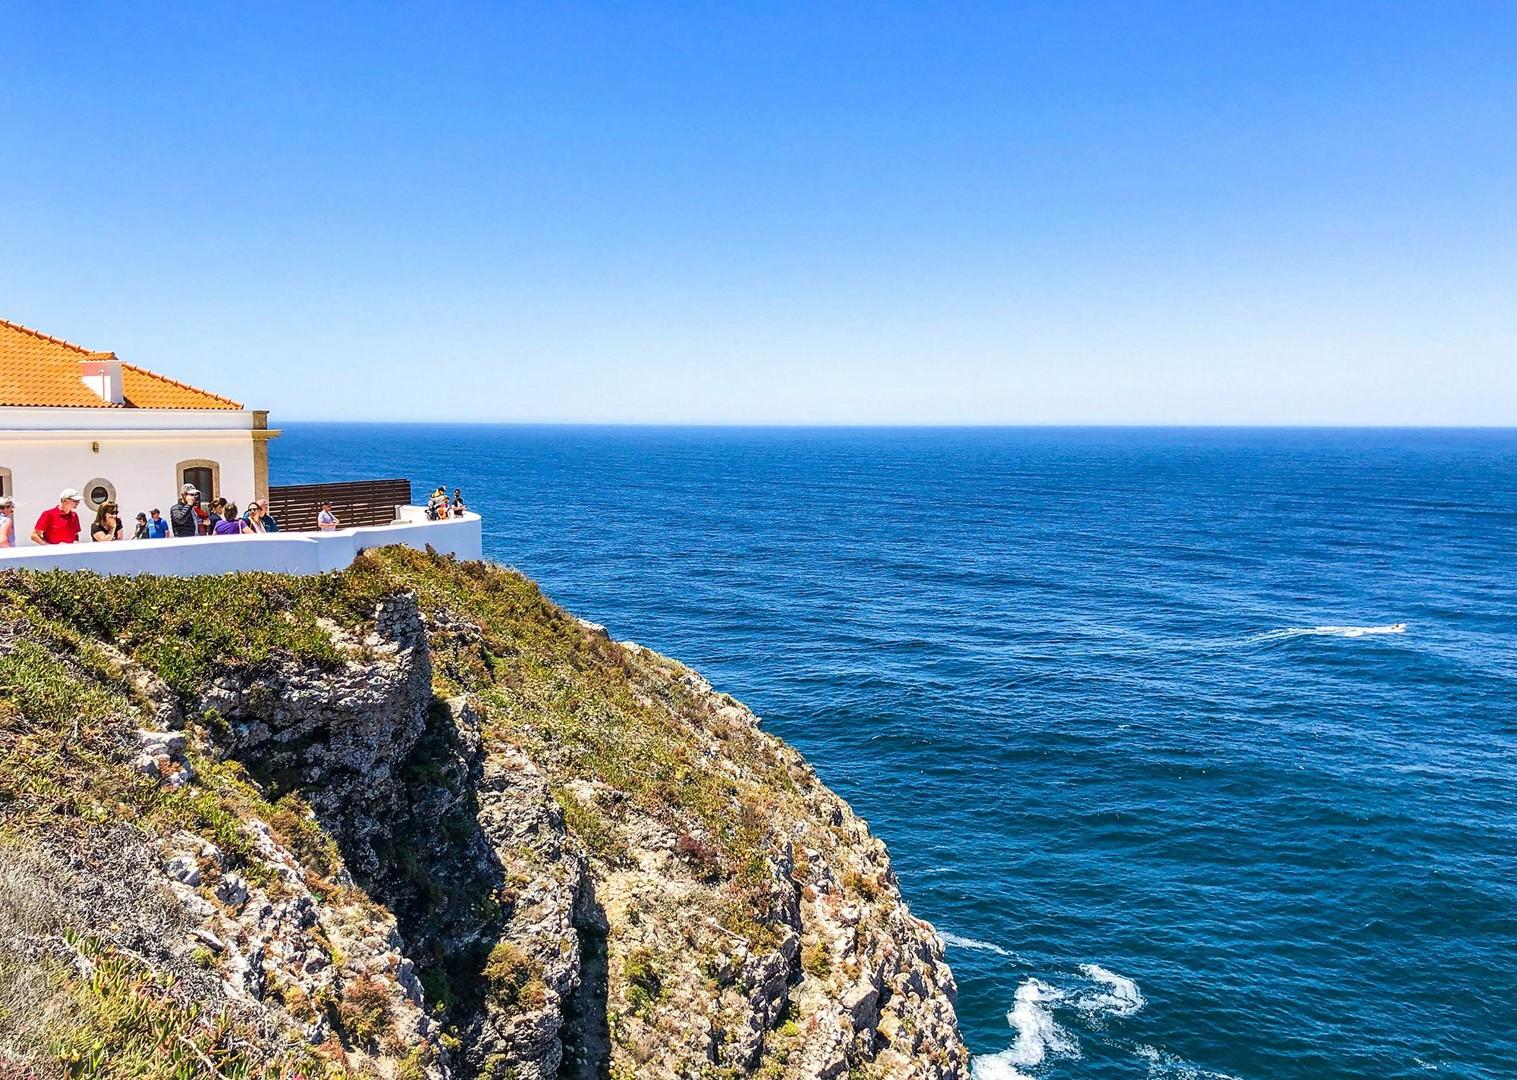 portugal-coast-cycling-leisure-holiday-biking-portuguese-trip.jpg - Portugal - Alentejo and Algarve Coastal Explorer - Self-Guided Leisure Cycling Holiday - Leisure Cycling